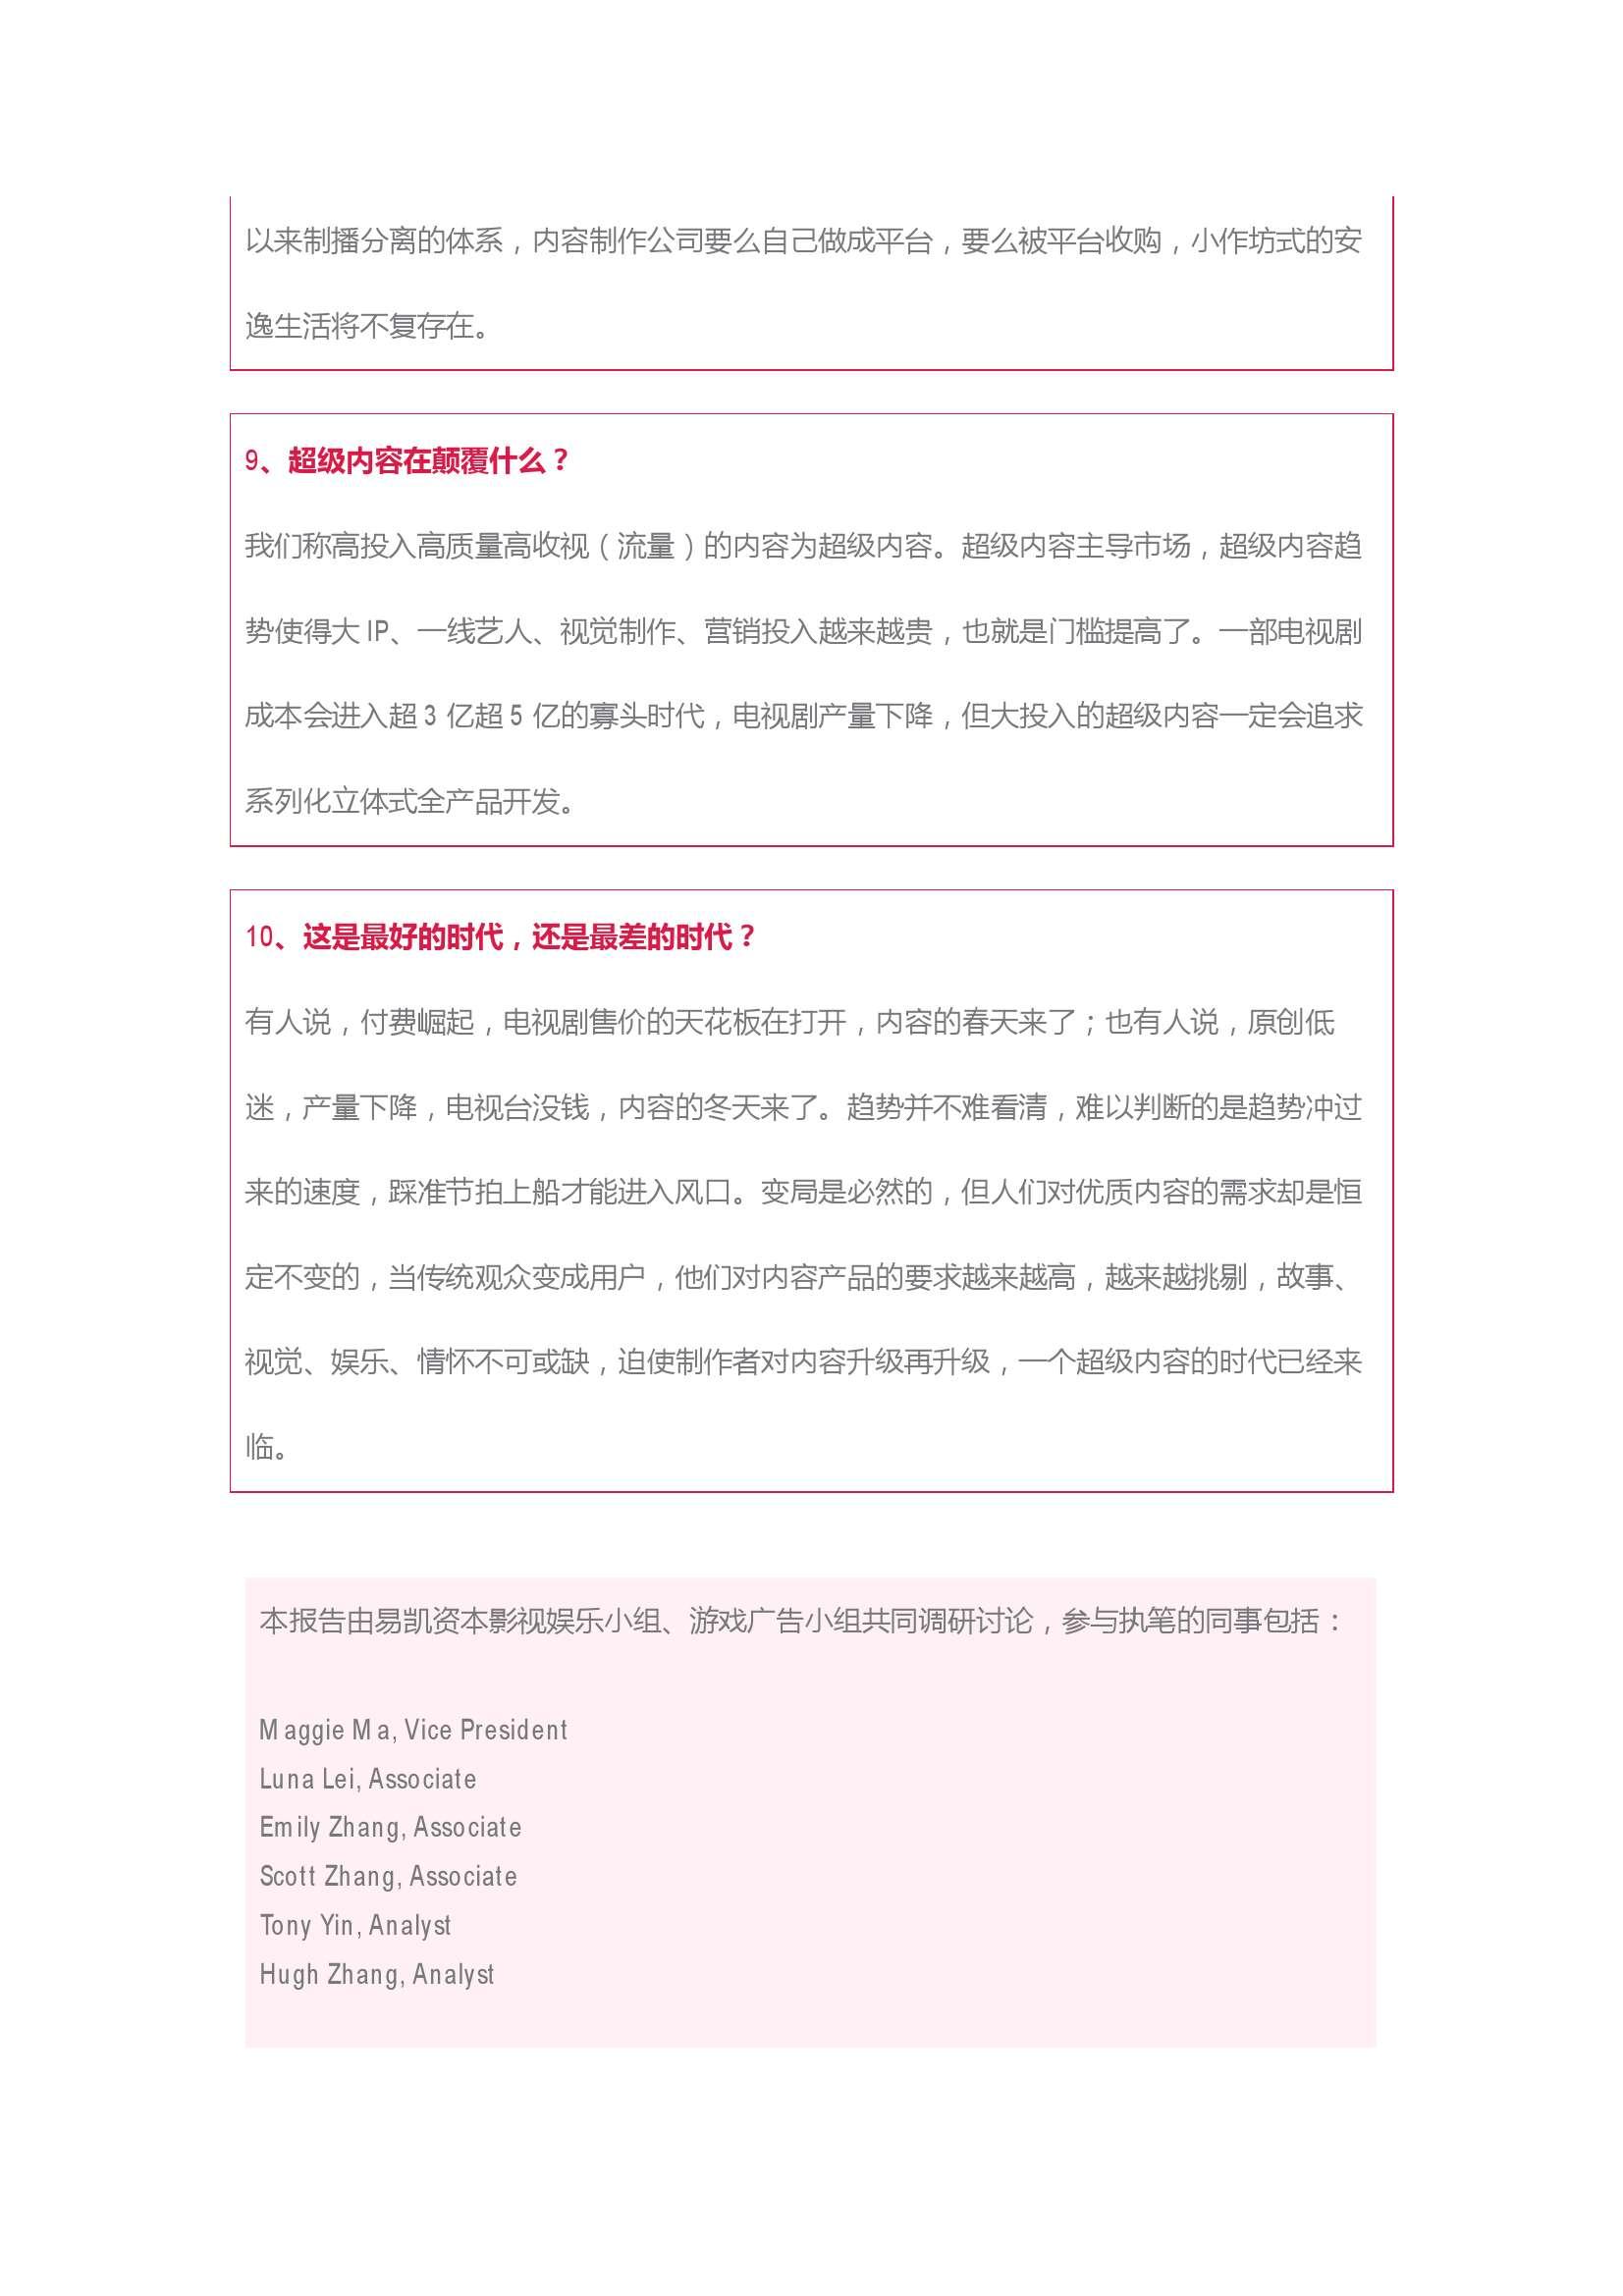 2016Q1中国娱乐产业季度观察_000025